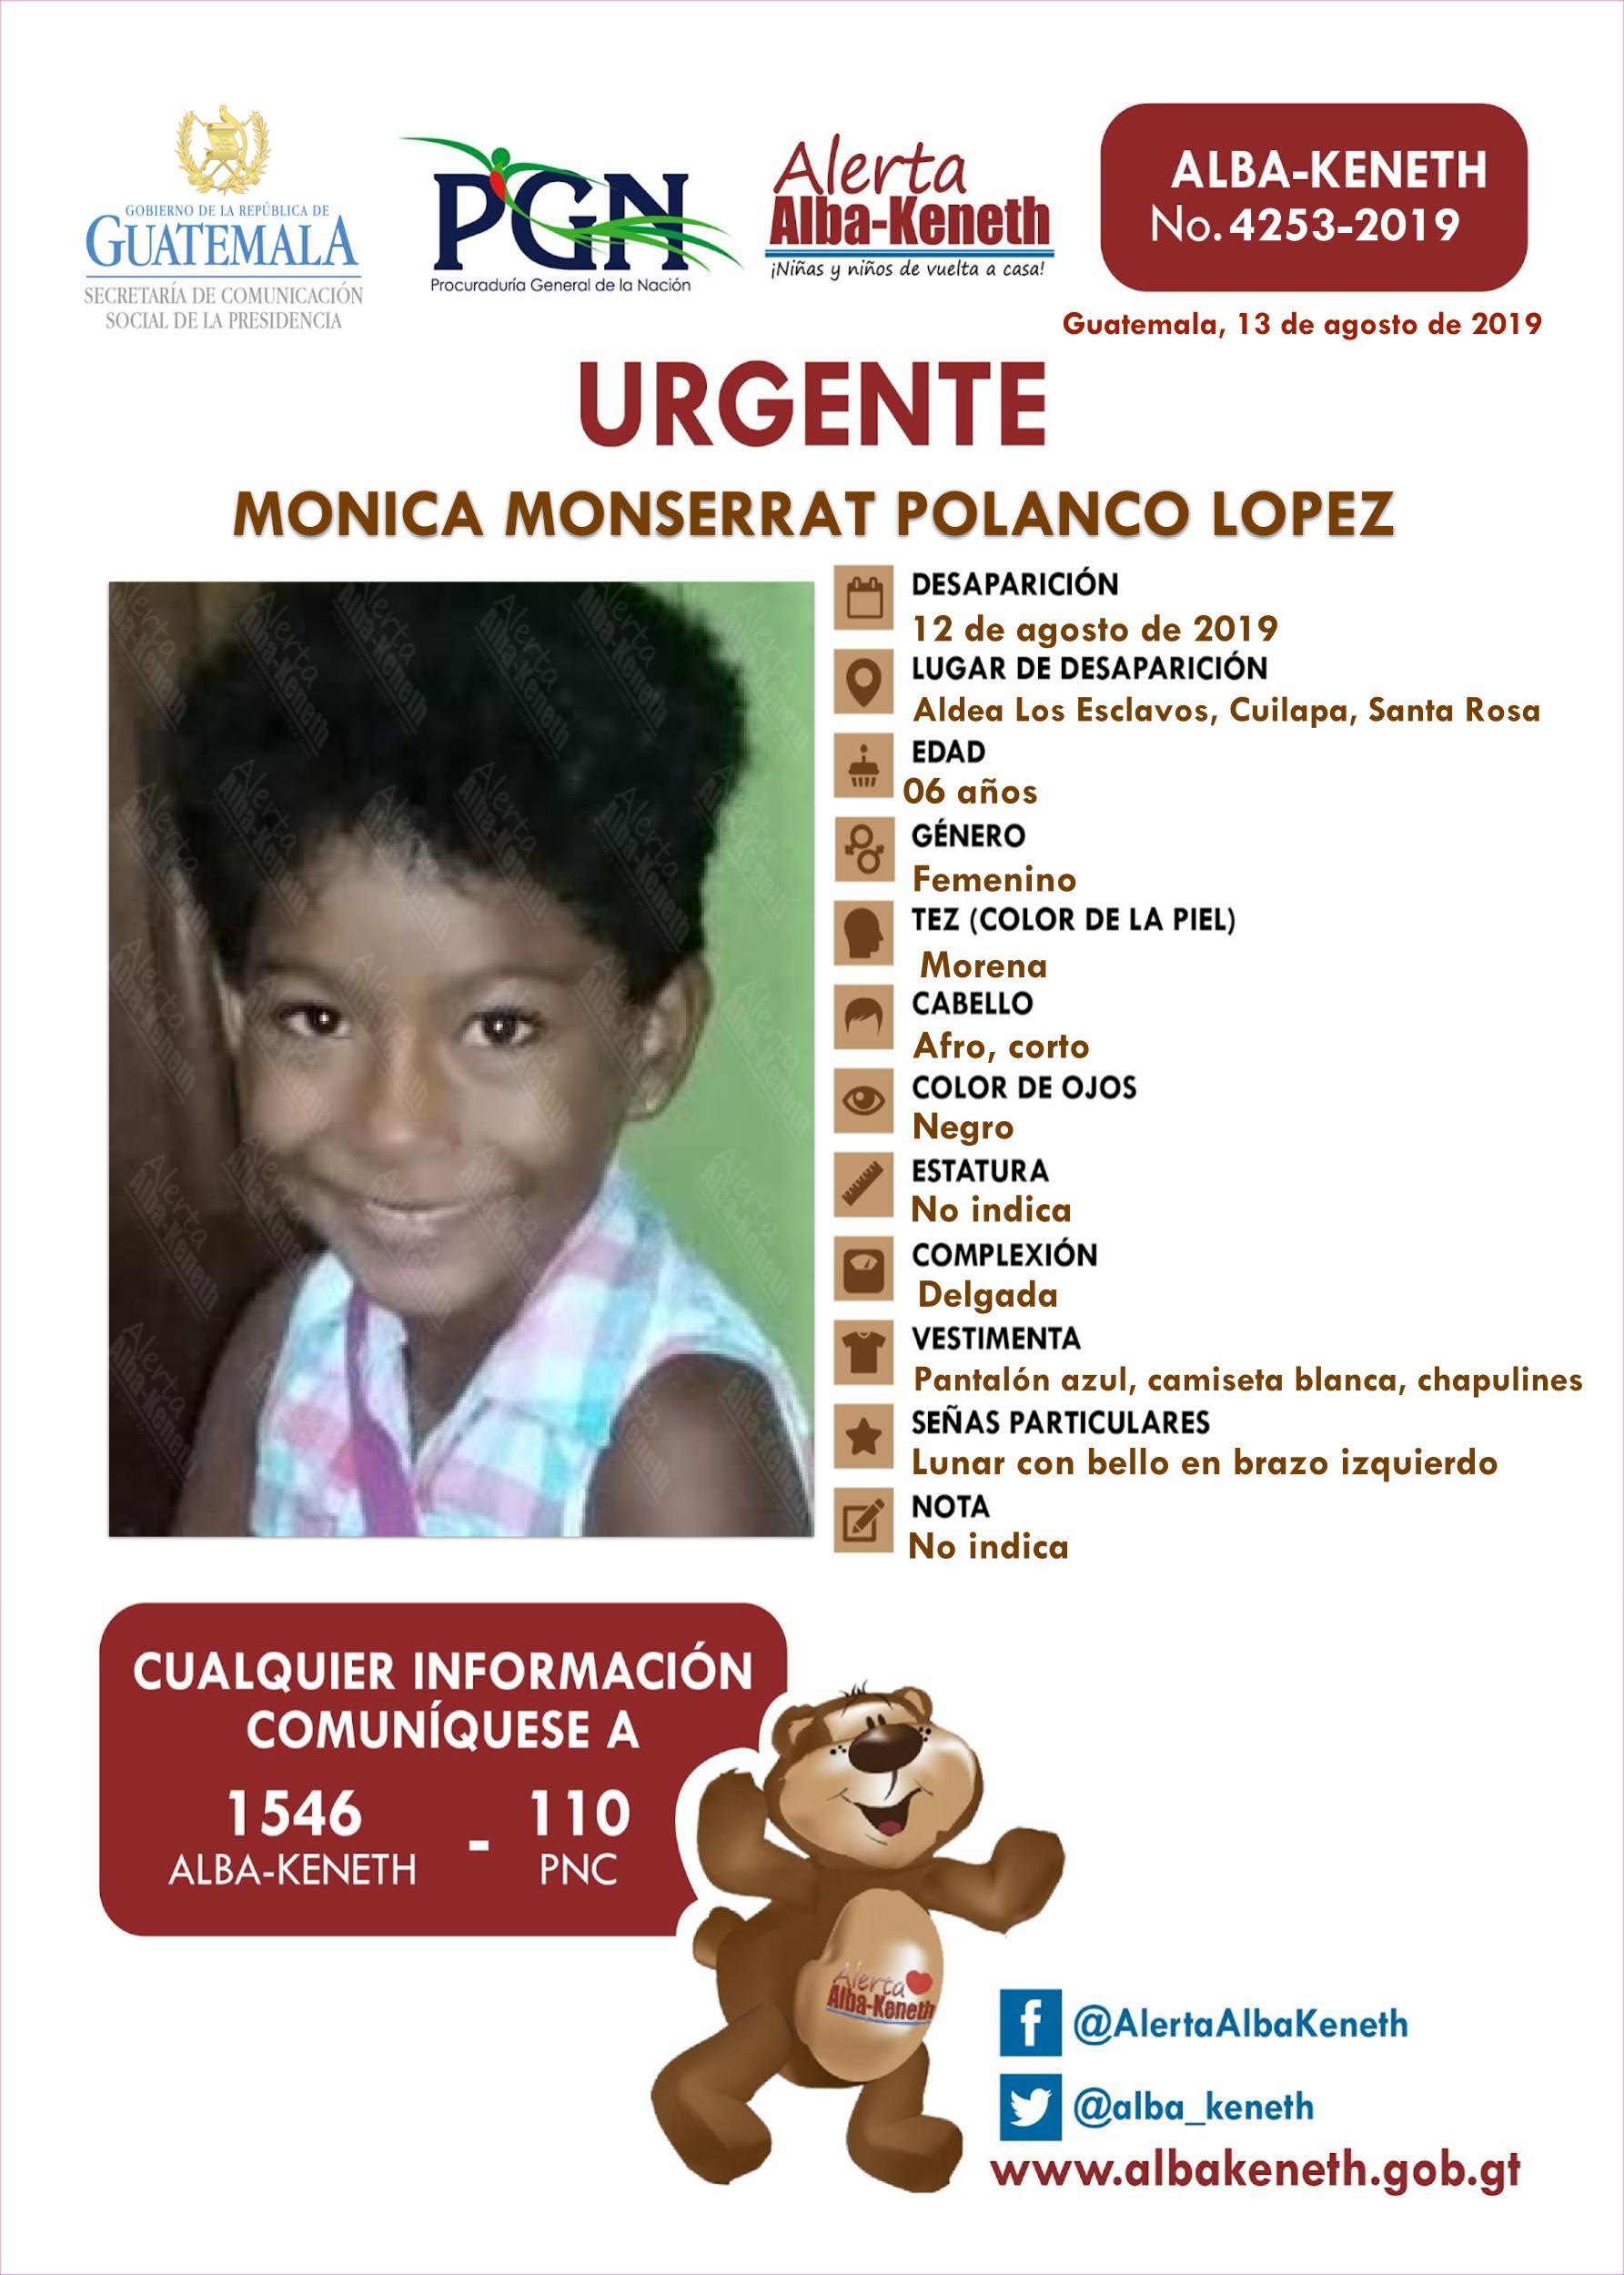 Monica Monserrat Polanco Lopez